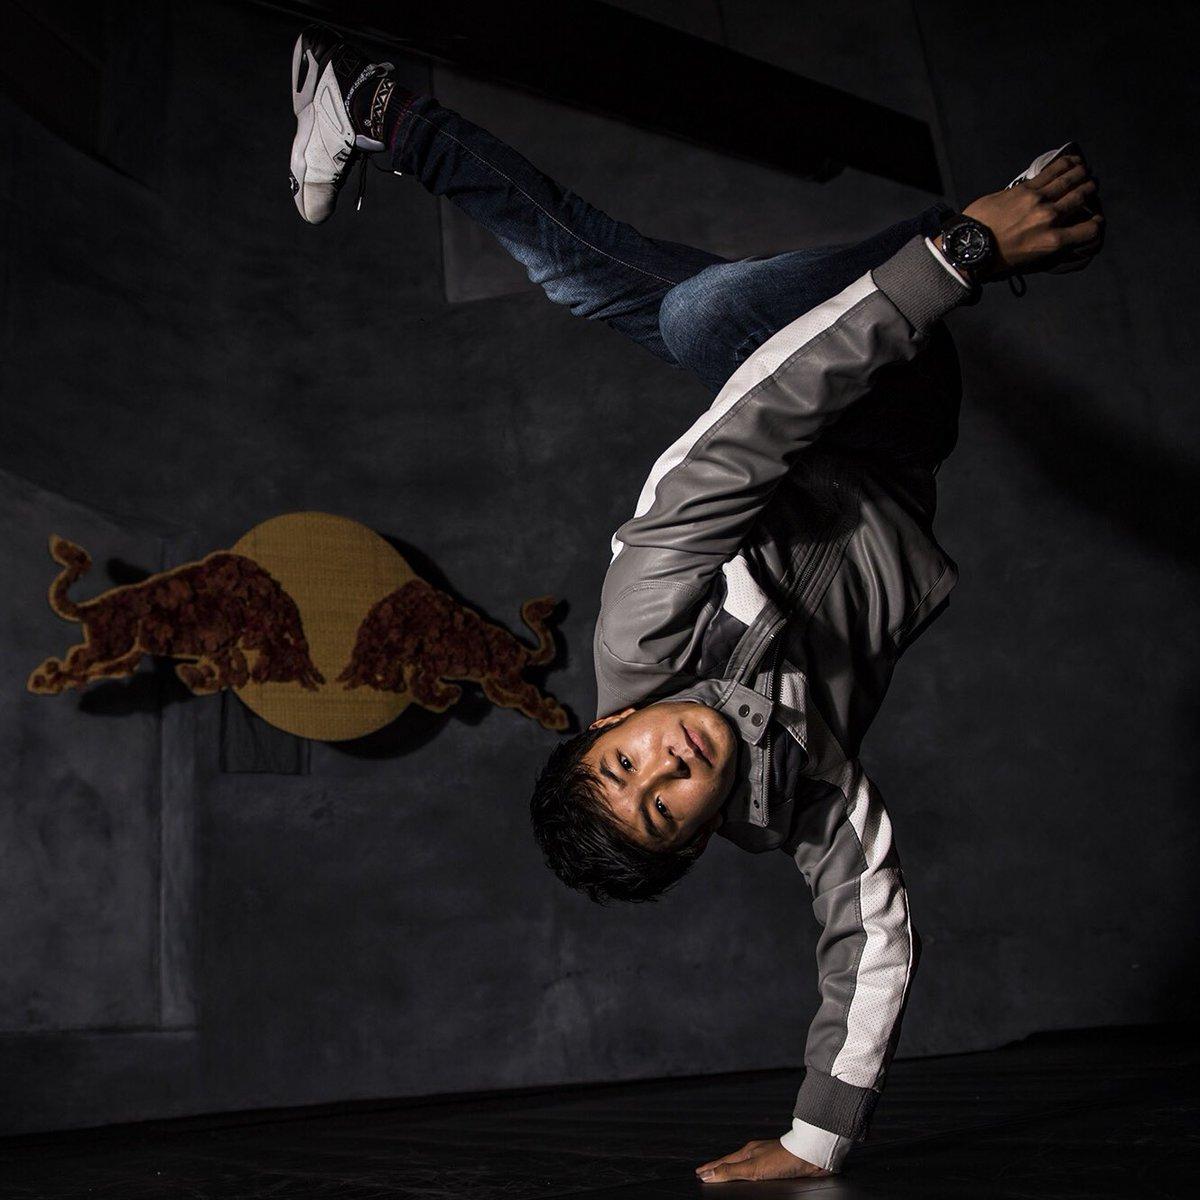 Red Bull BC ONE World Final coming soon! . by @Jason_Halayko  . #redbull #redbullbcone #bcone #bconeworldfinal #bboyshigekix<br>http://pic.twitter.com/wg7Ne0bJsv